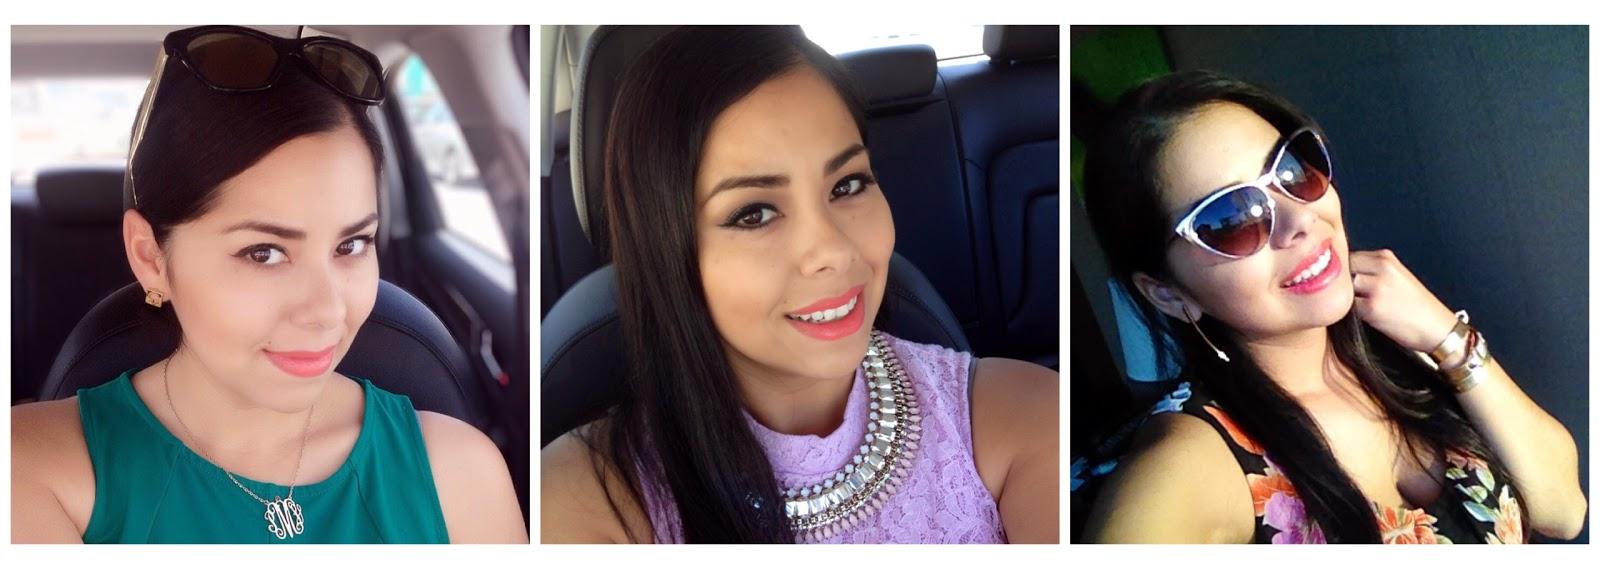 Selfie, how to take a good selfie, #neutrogenaselfie, Neutrogena products, good skin care regimen